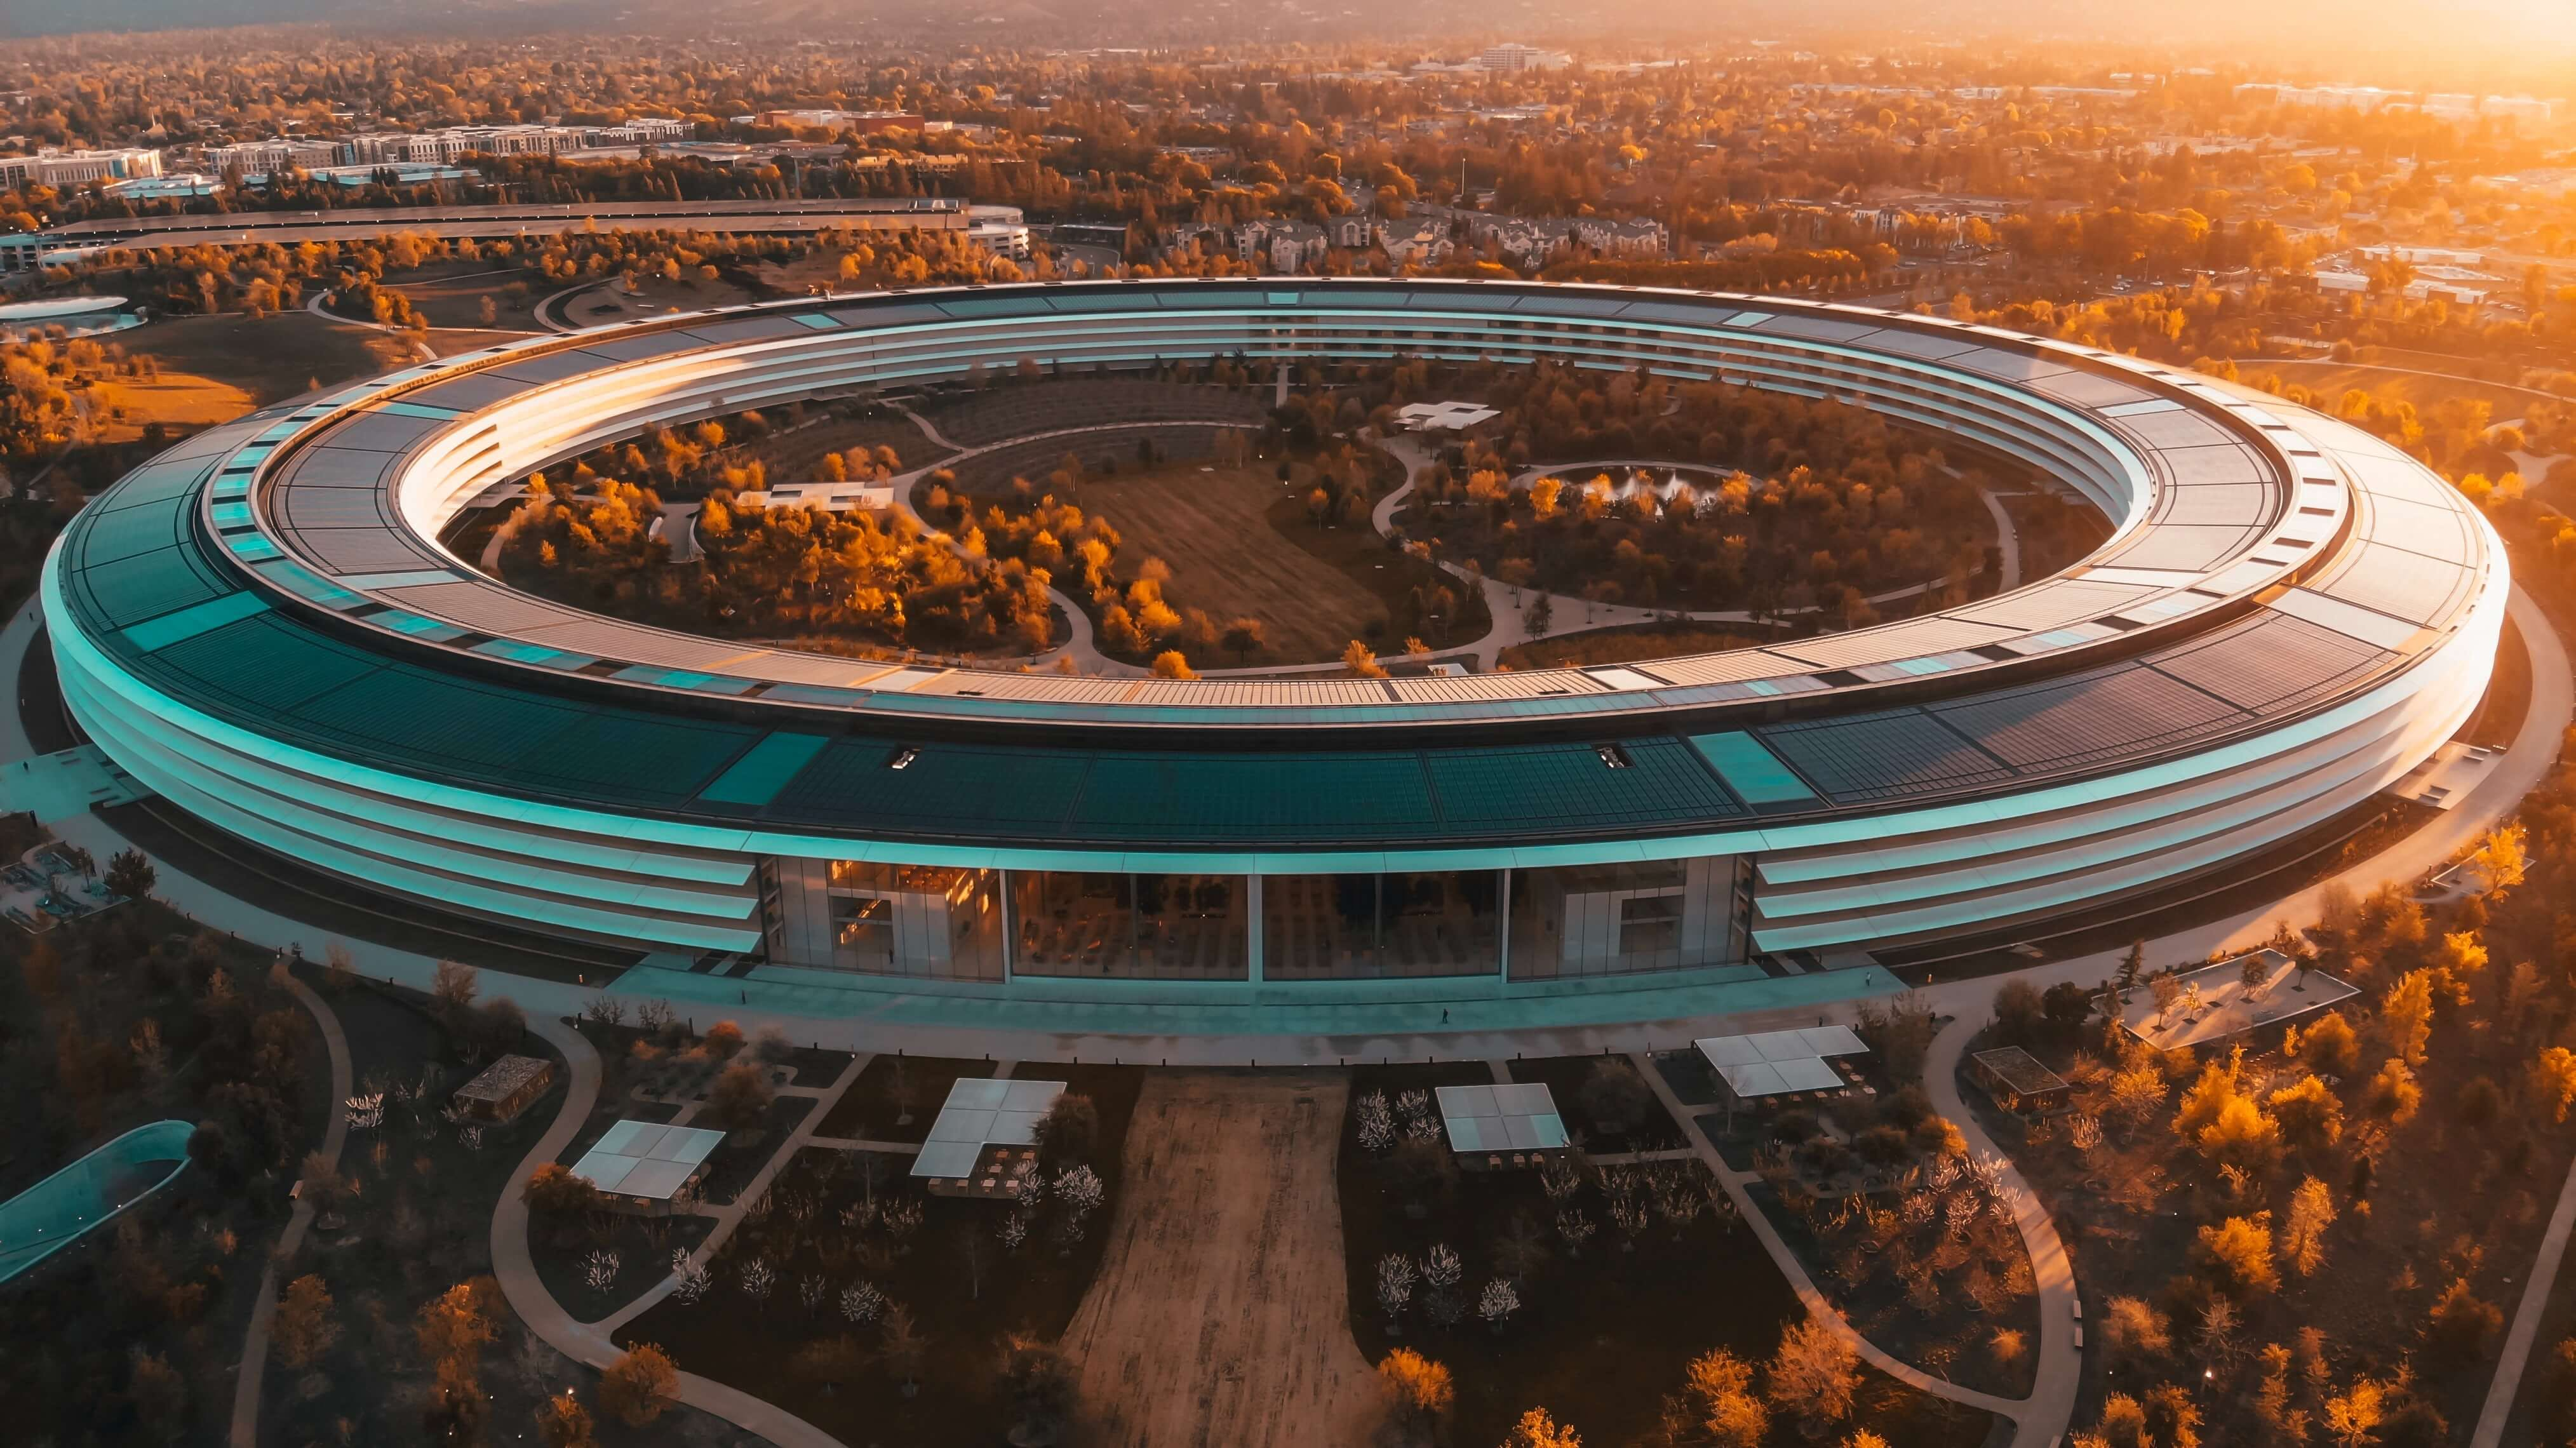 Apple's Environmental Report 2020 Highlights